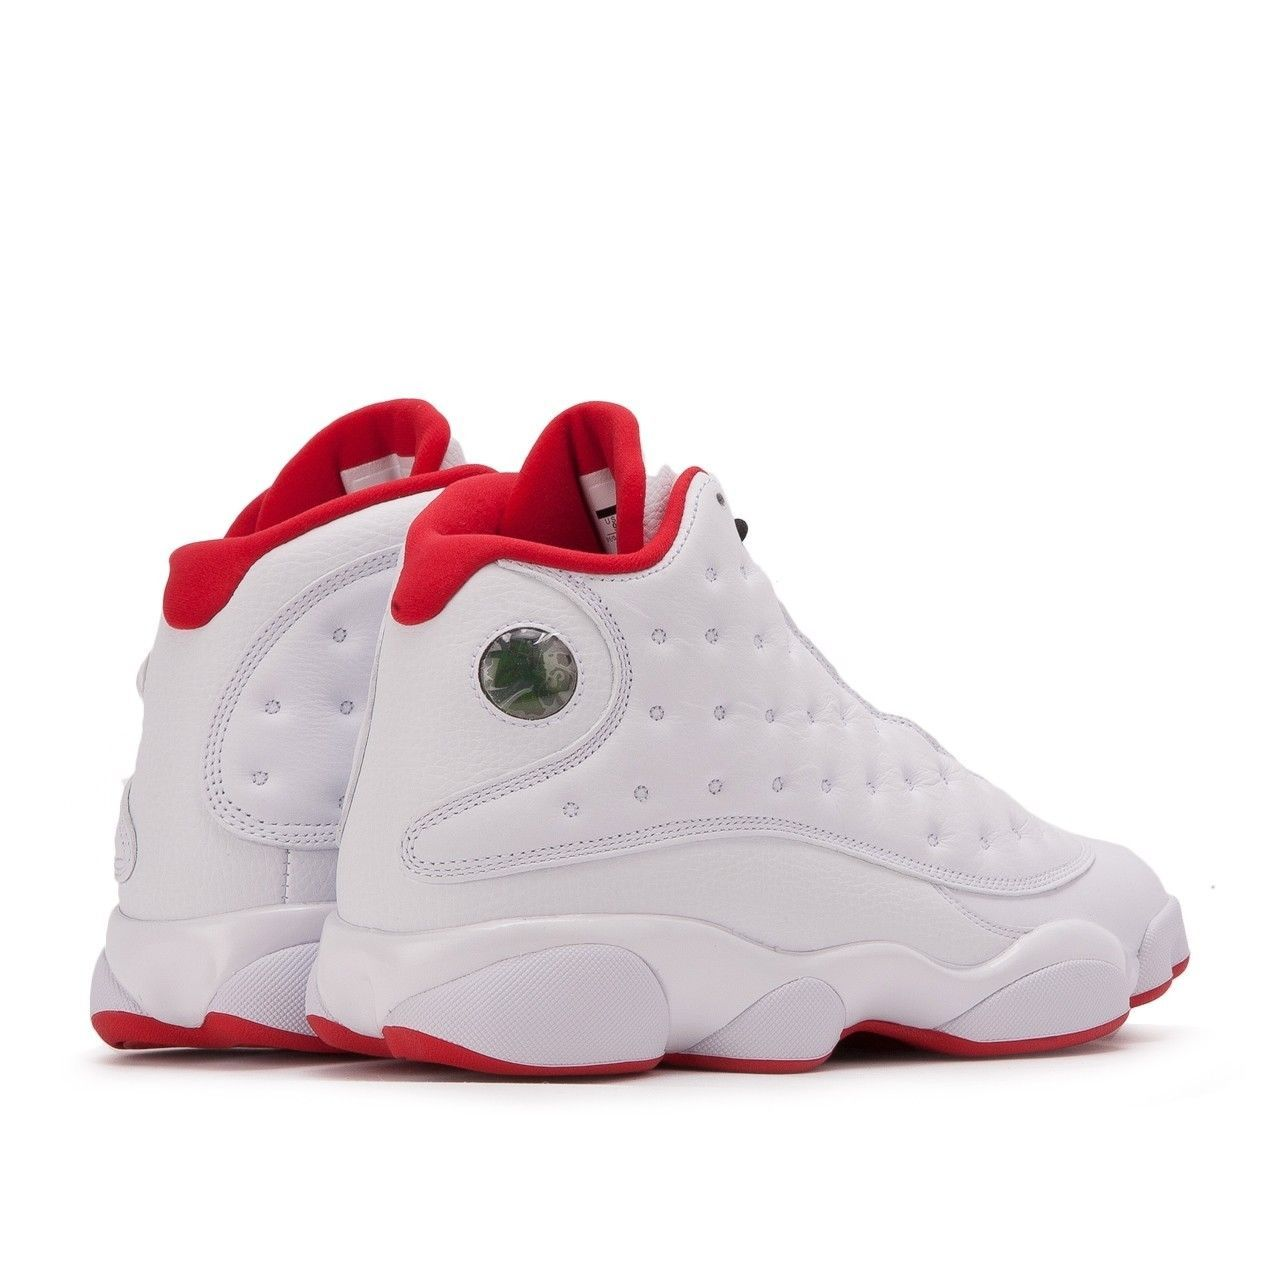 05ee5cb20fe0e1 Nike Men s Air Jordan 13 Retro BasketBall Sneakers Size 7 to 14 us 414571  103